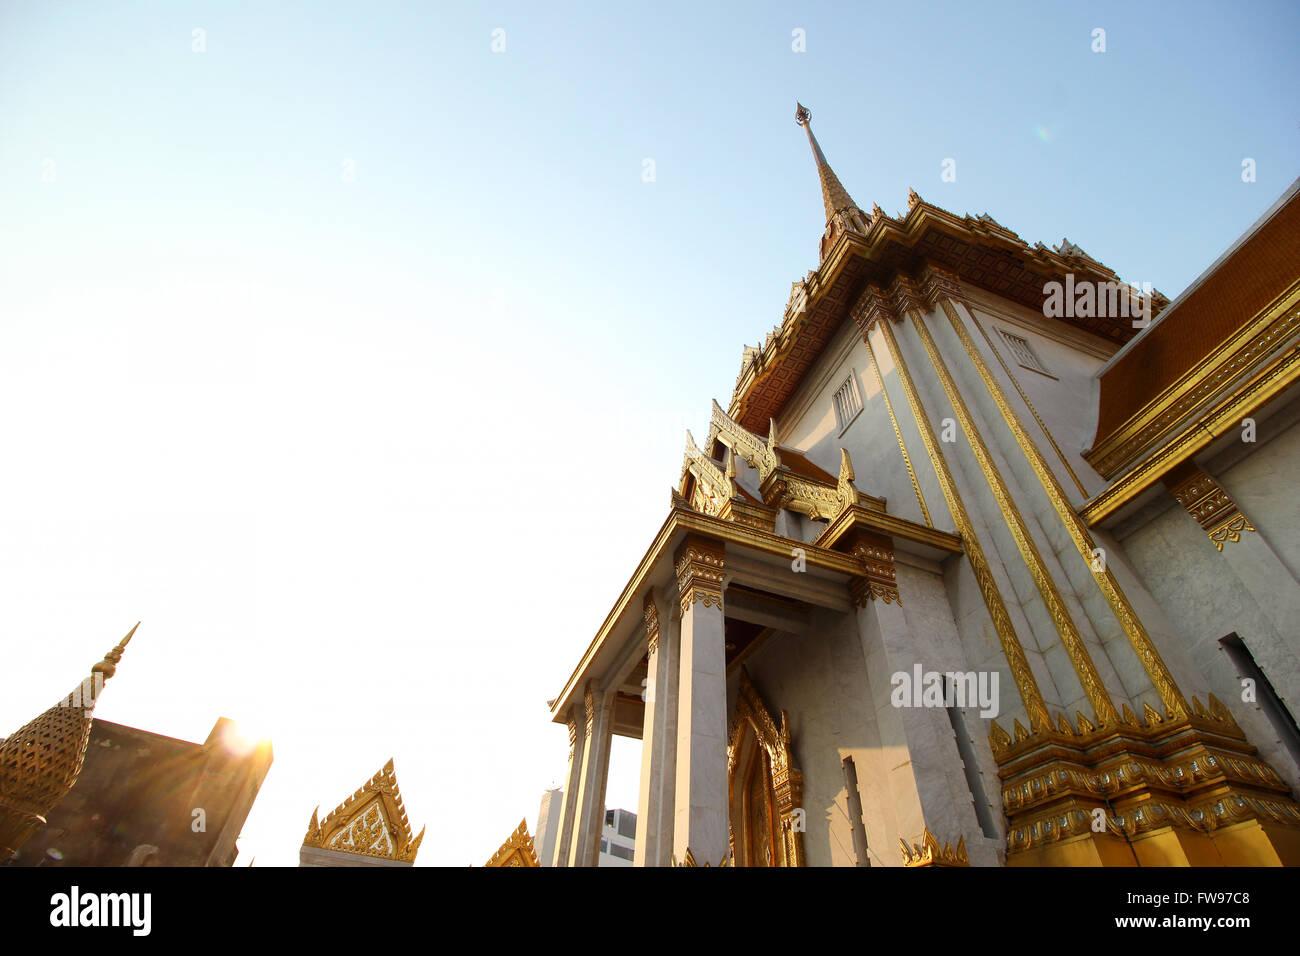 Guardando il maestoso Wat Traimit, Bangkok, Thailandia Immagini Stock